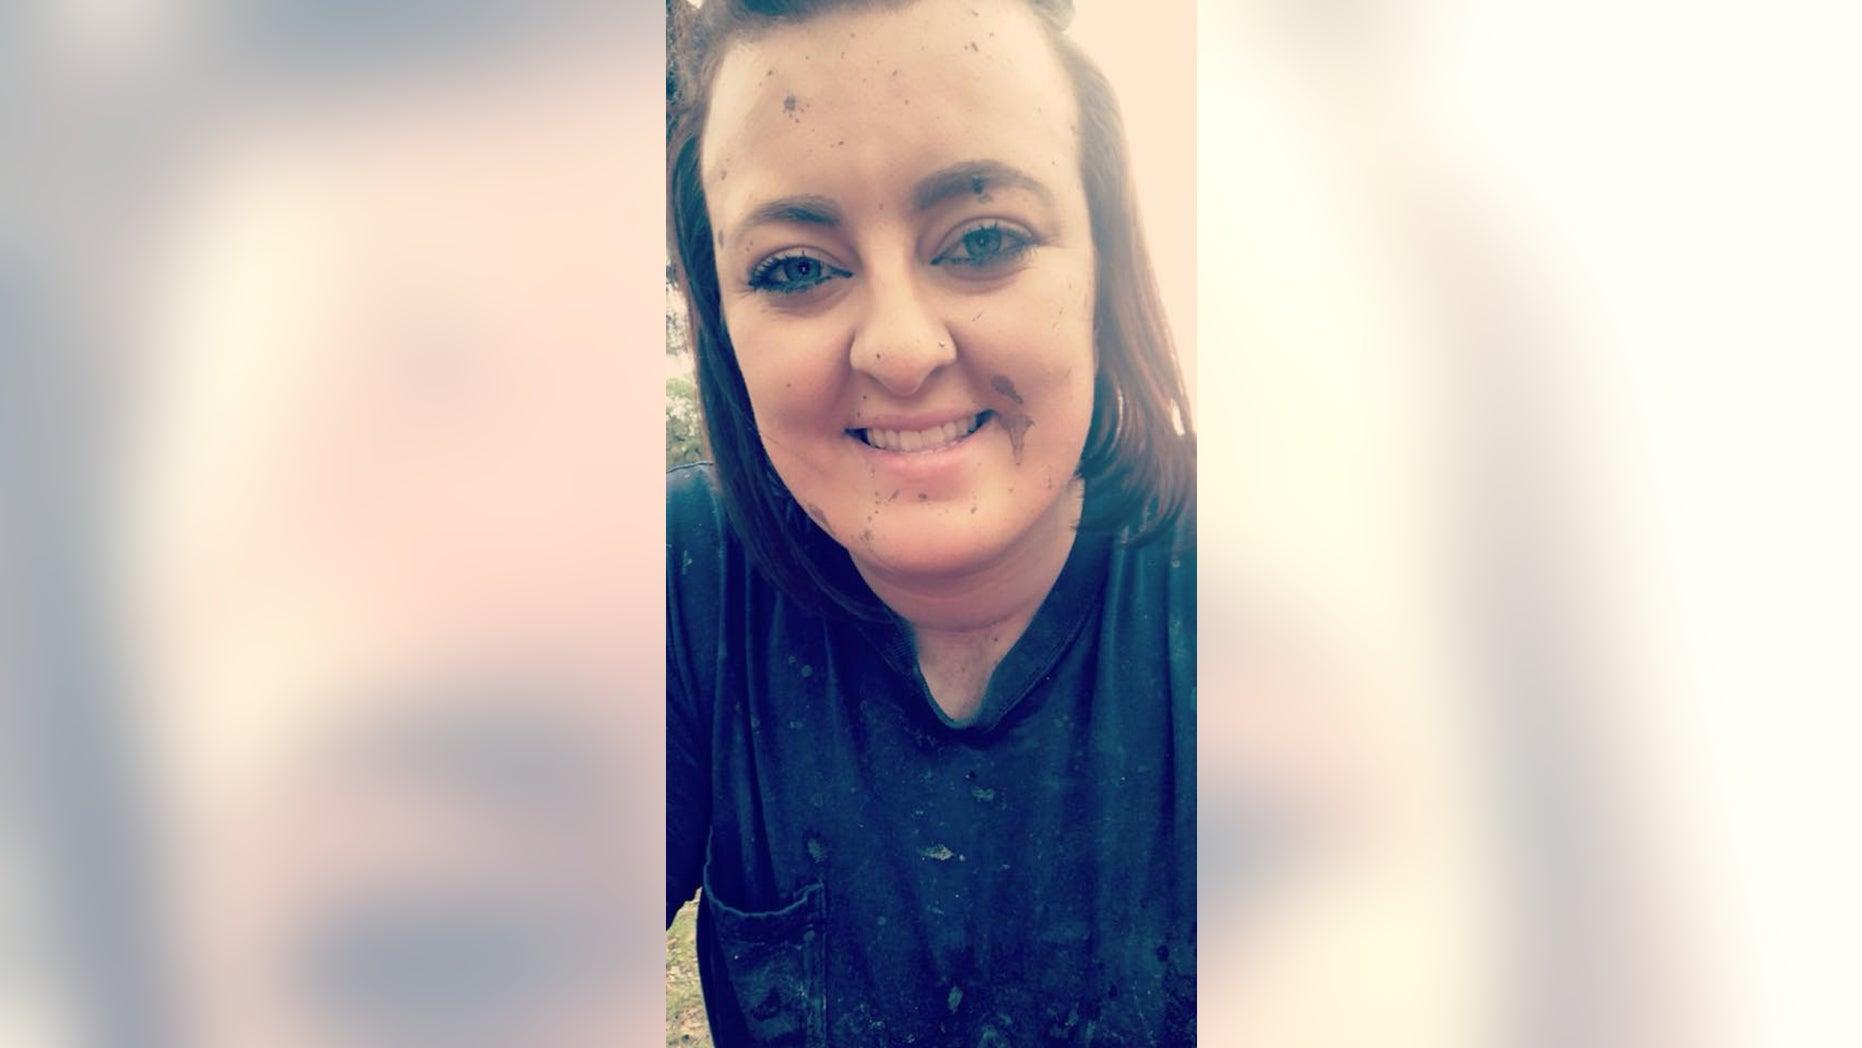 Kourtney Lambert, 23, was killed by lightning over the weekend.